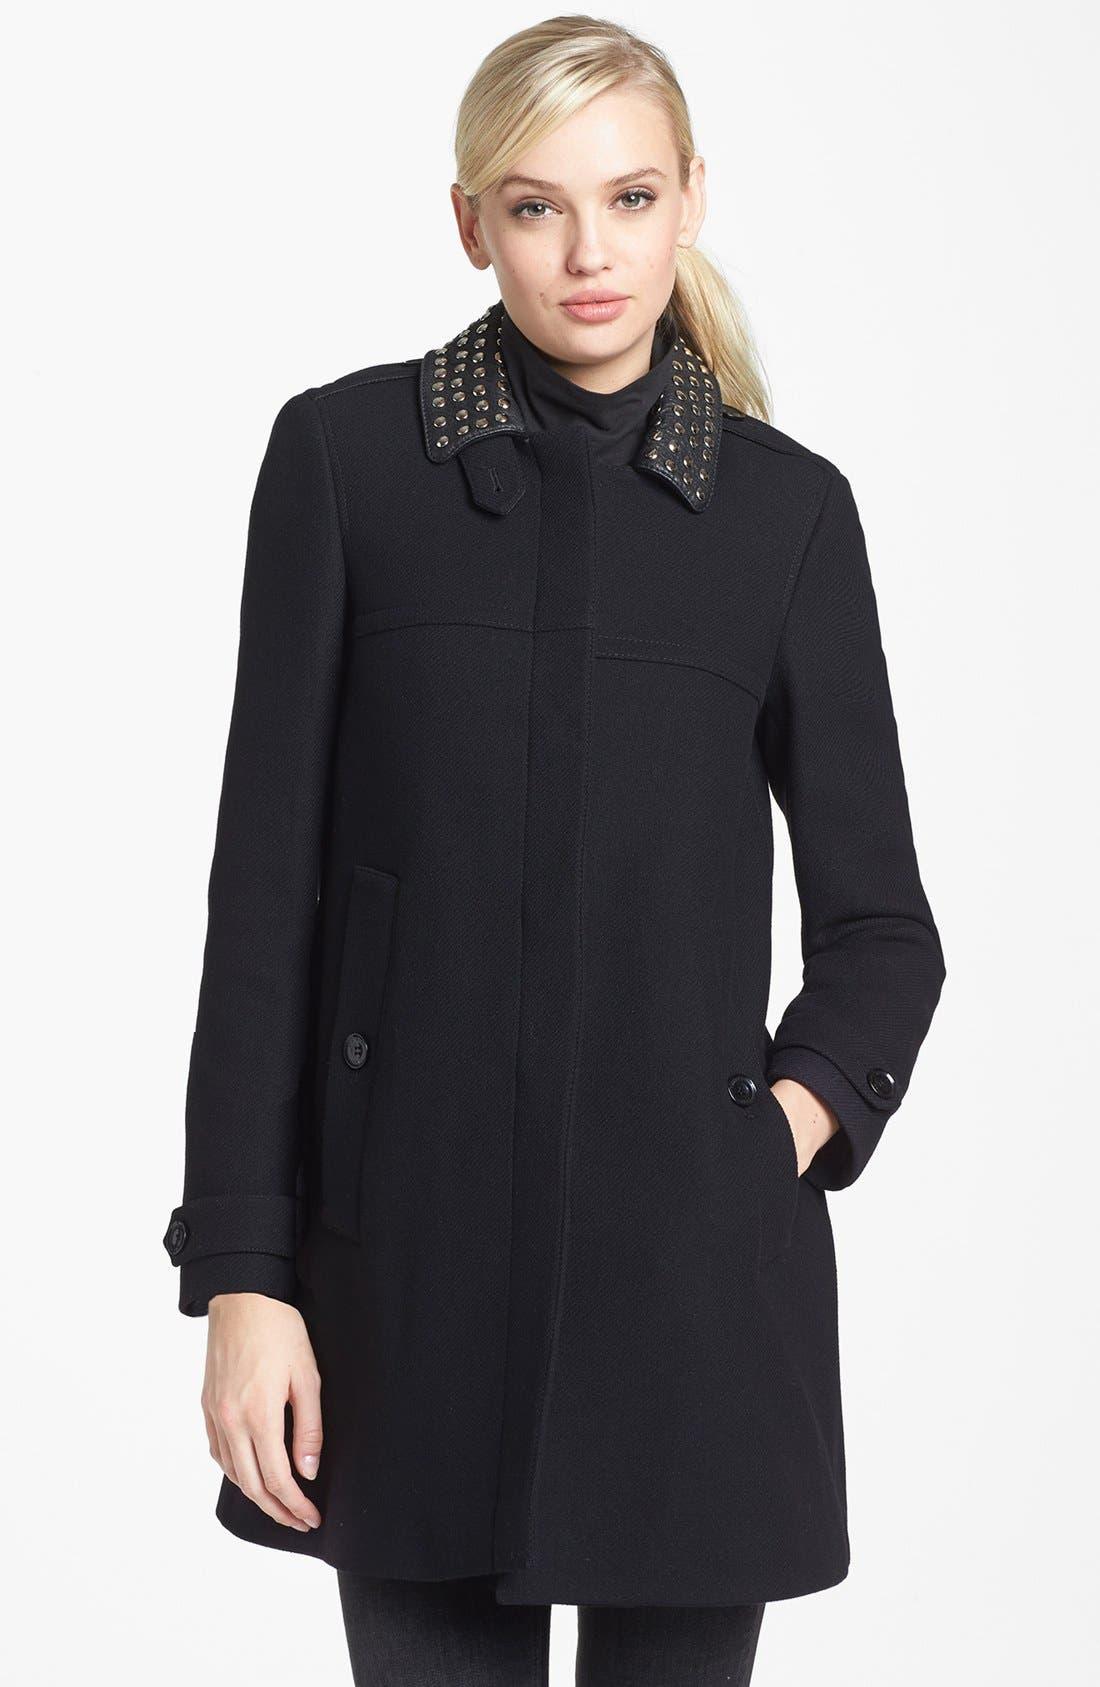 Alternate Image 1 Selected - Burberry Brit 'Masondale' Wool Blend Coat